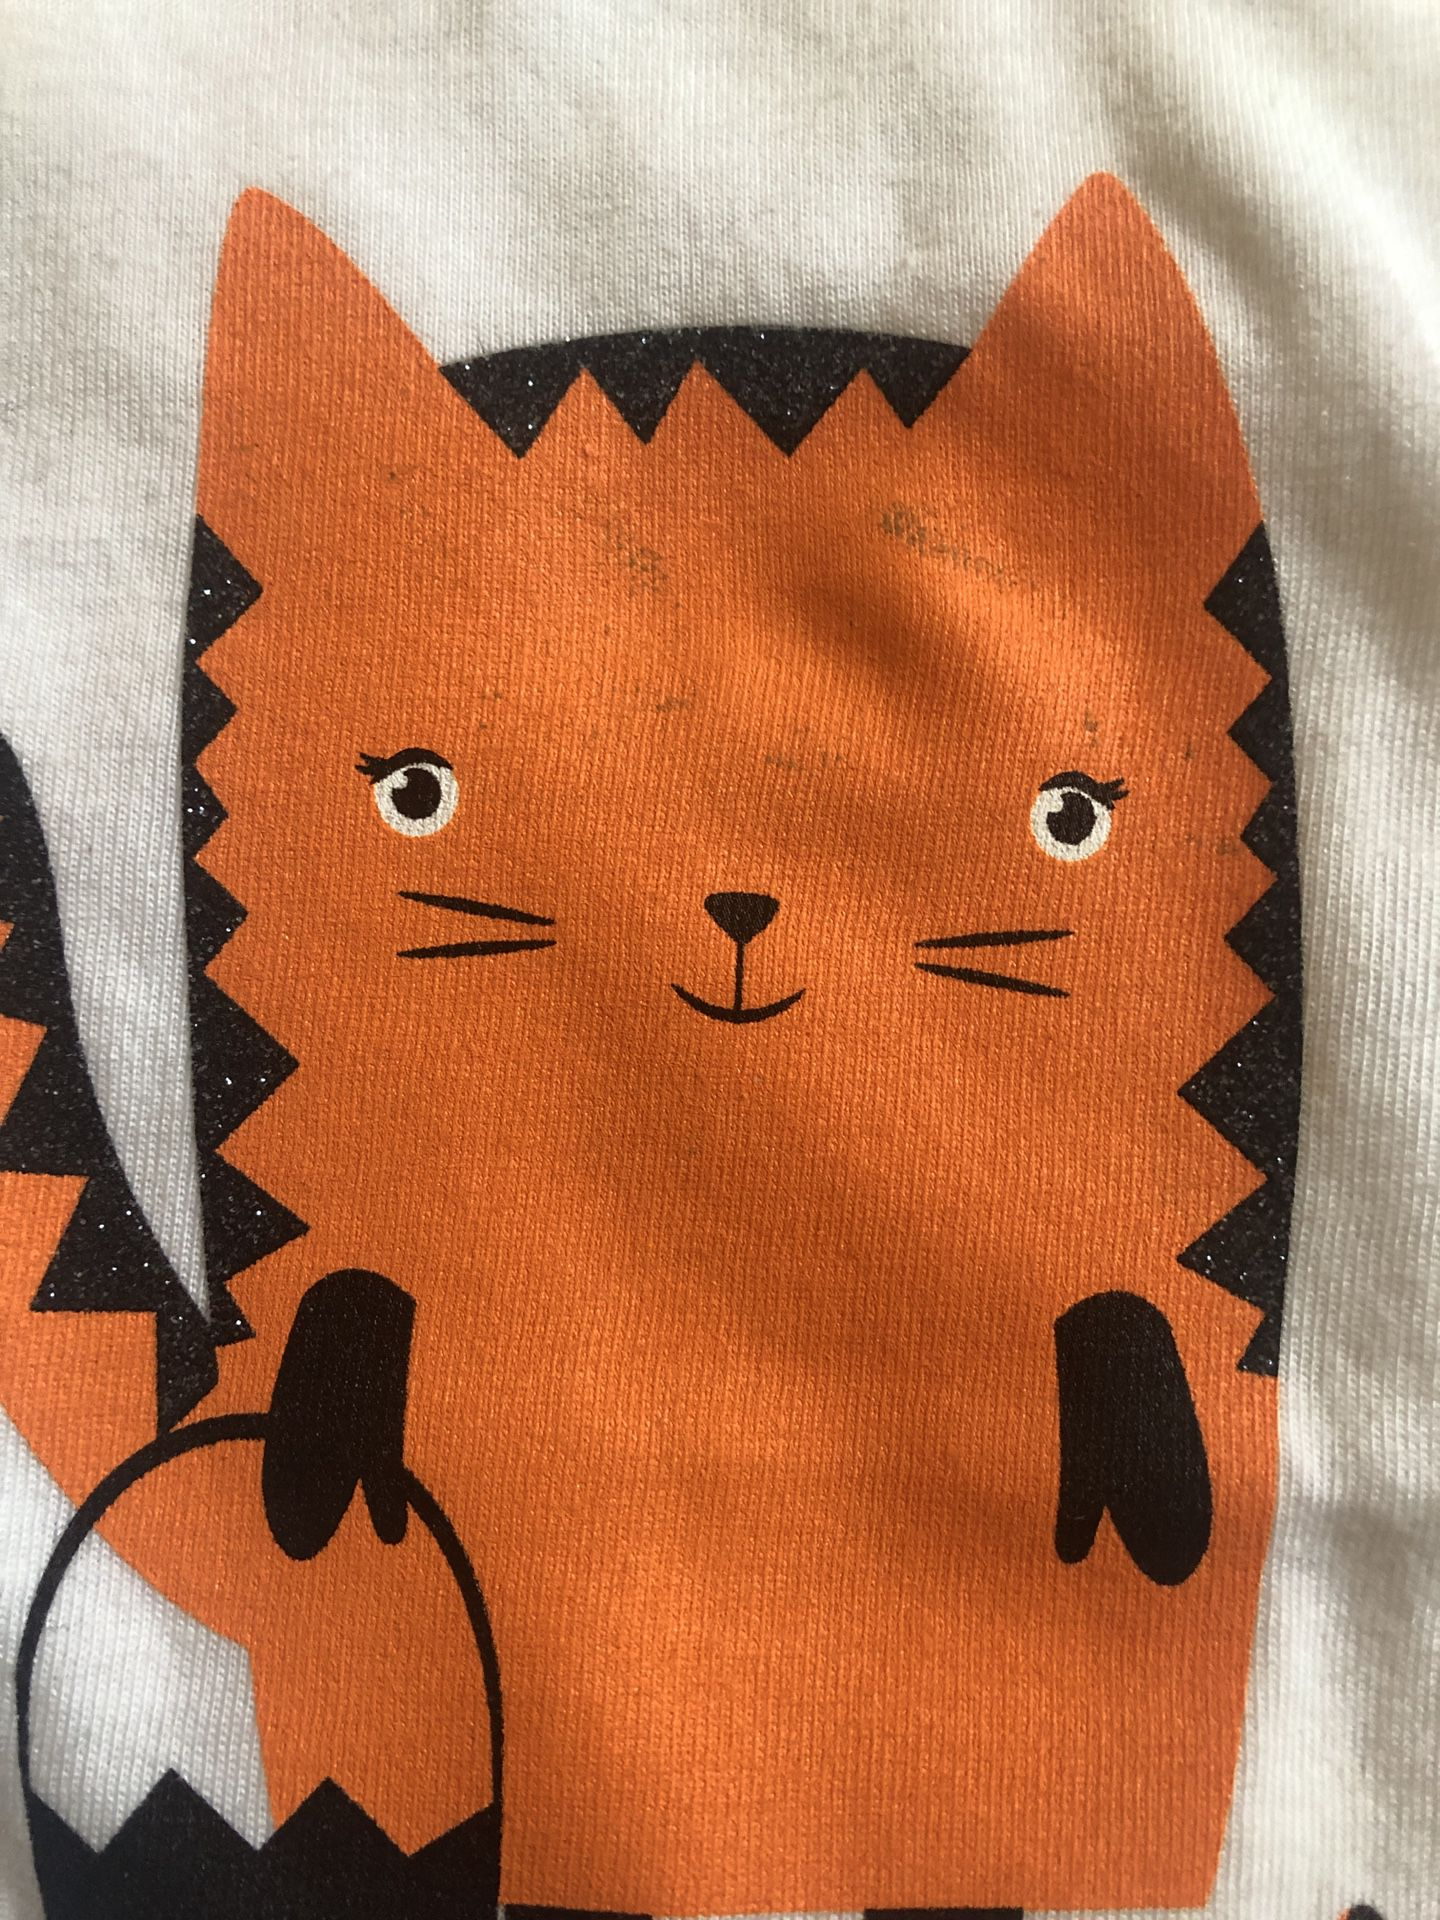 NEW 3T Toddler Girls Halloween shirt lot: Paw Patrol, Sesame Street Elmo & Cat & Jack